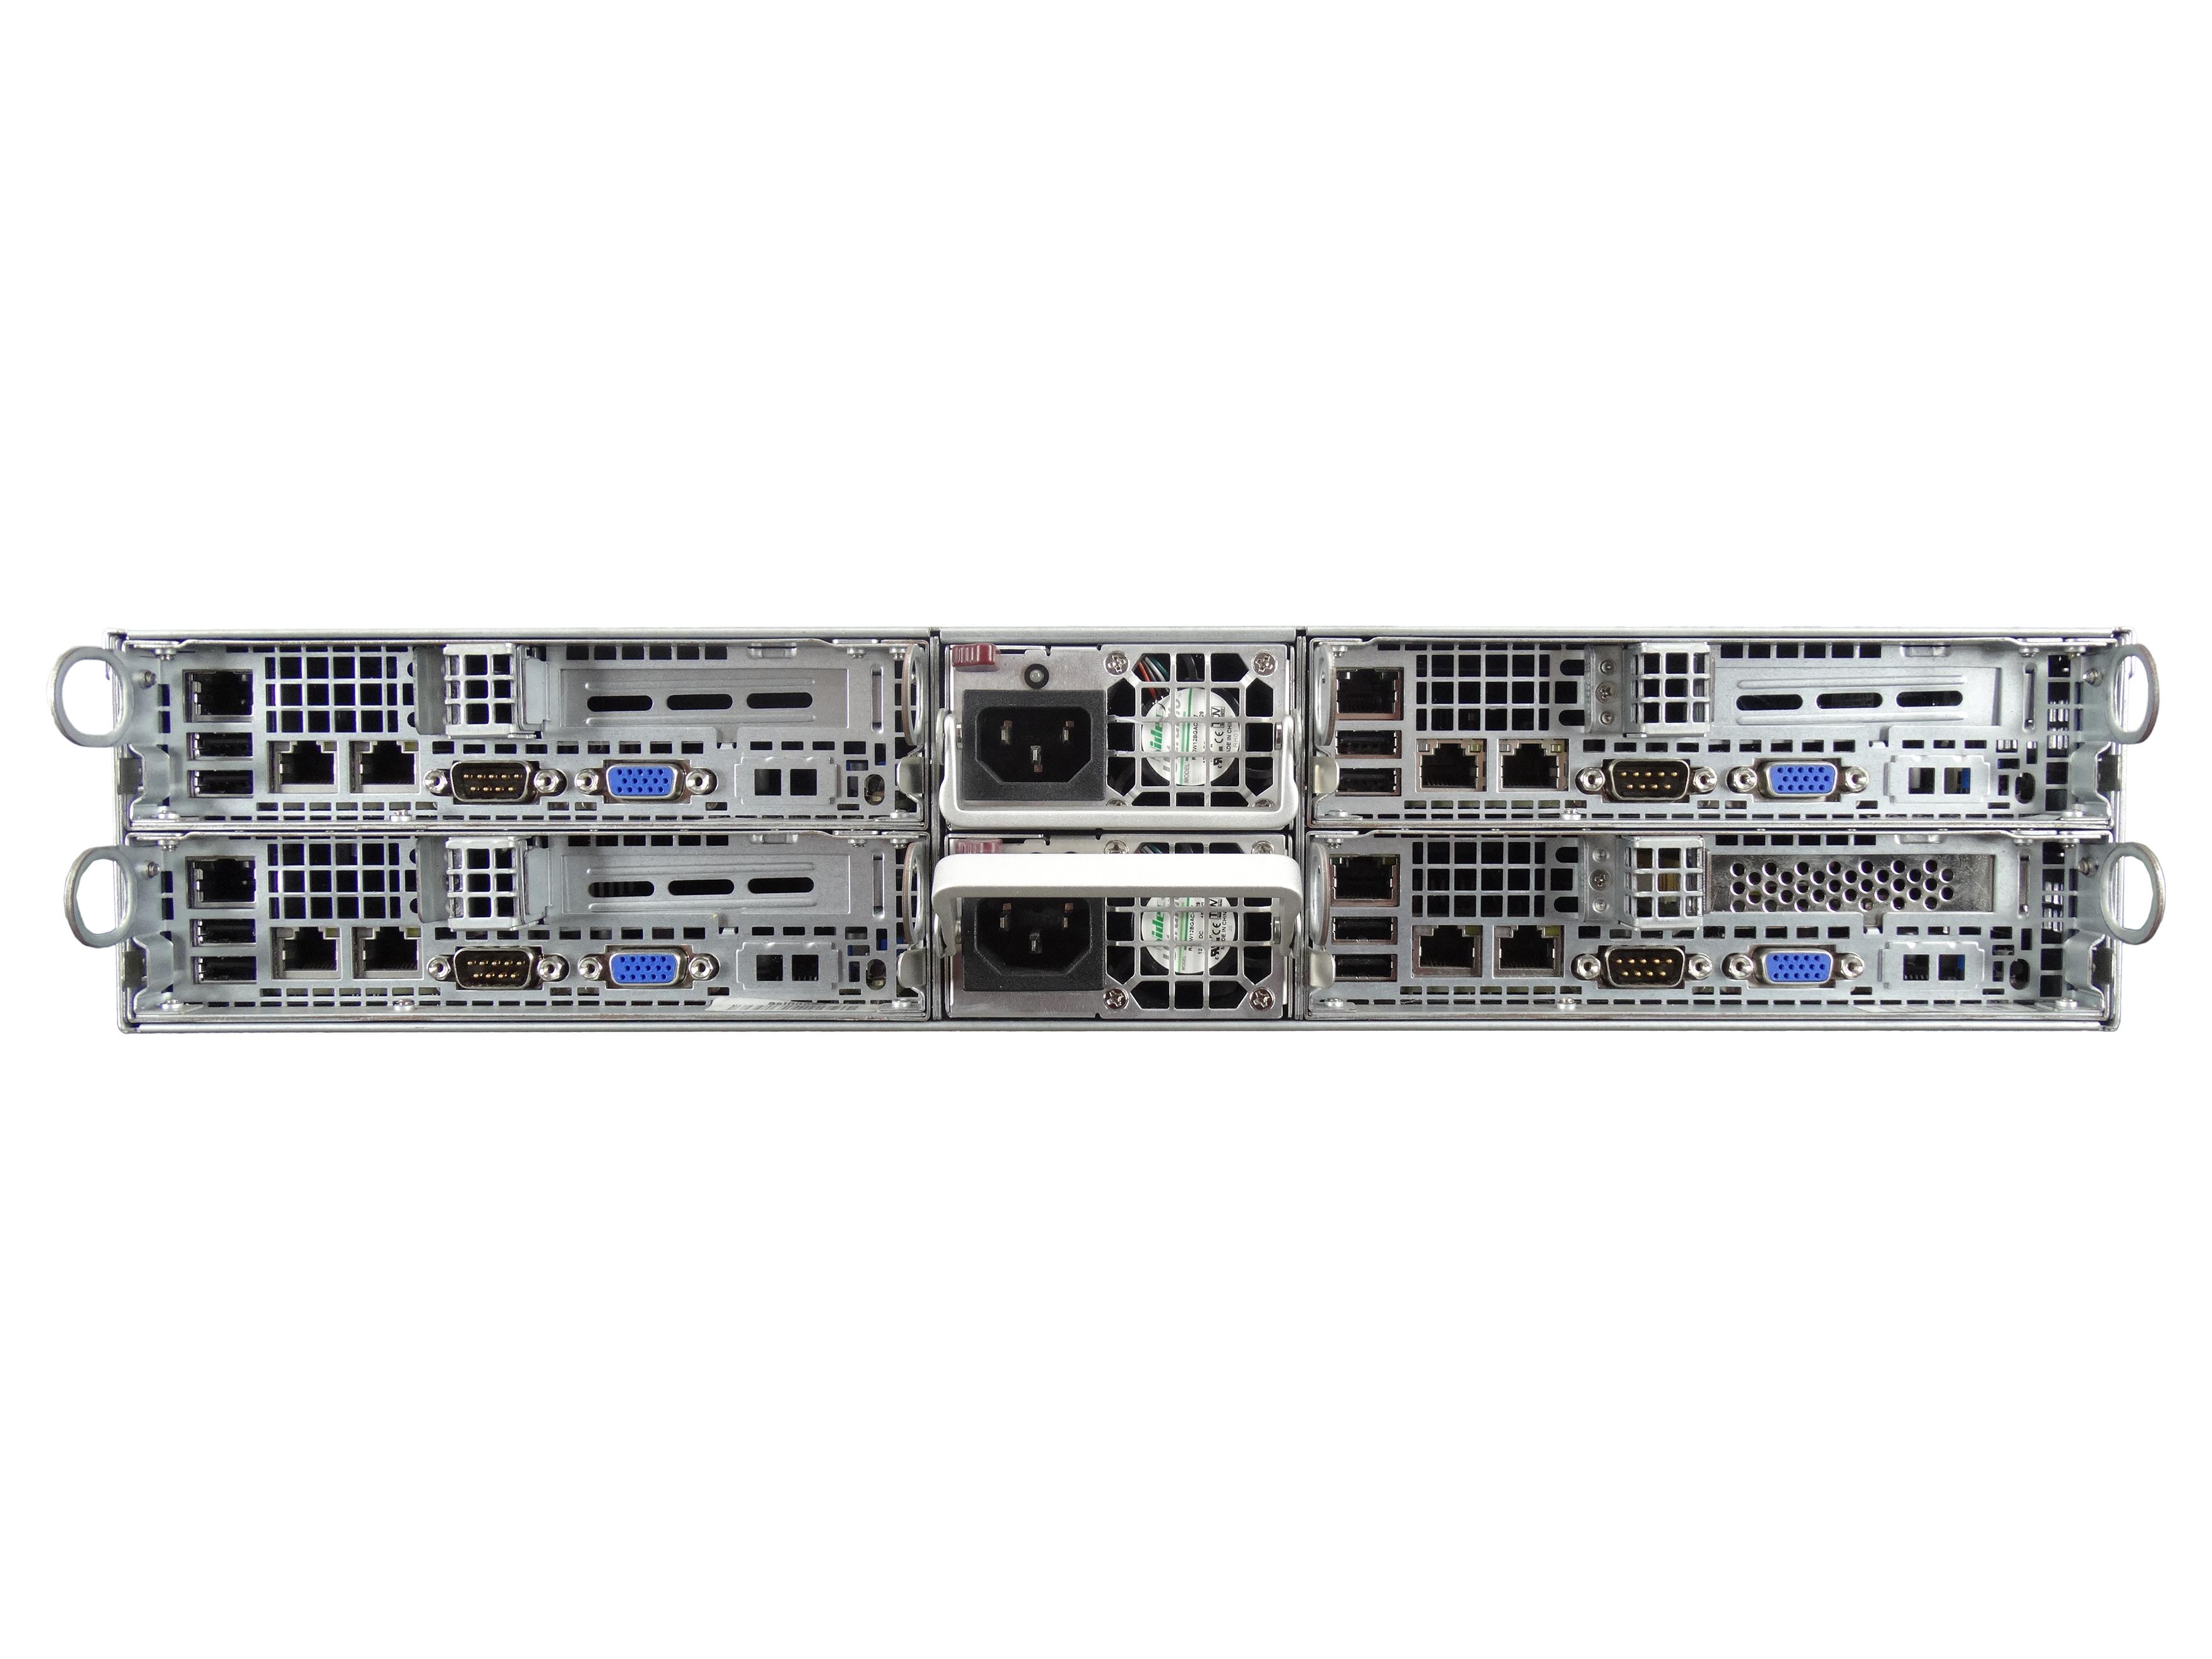 SuperMicro-5026Ti-BTRF-2U-Barebone-Server-W-4x-X8SIT-F-2x-920W-PWS thumbnail 2